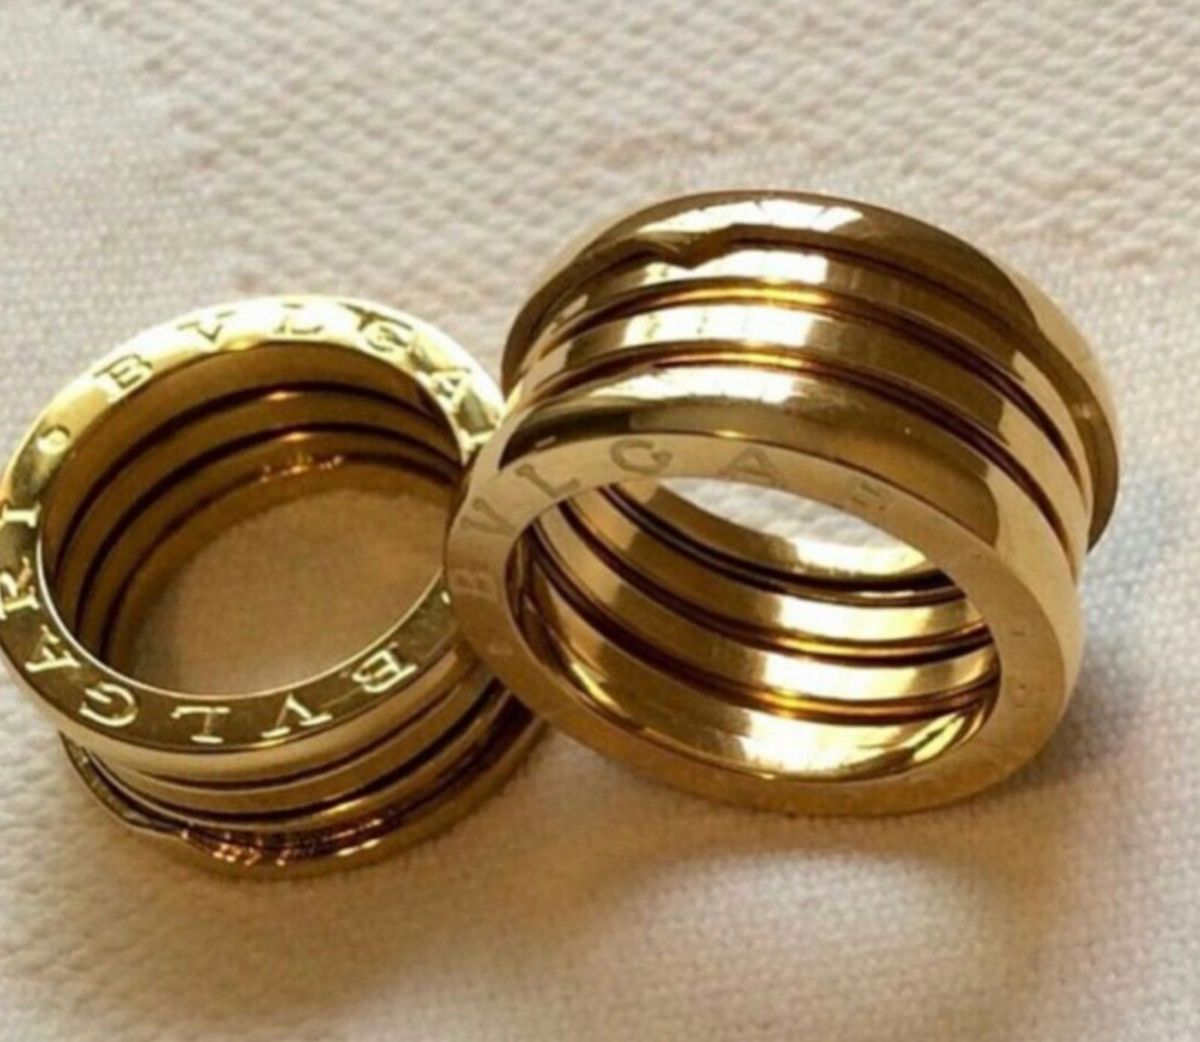 db9621e6f90 aliança de ouro 18k modelo bvlgari - jóias bvlgari